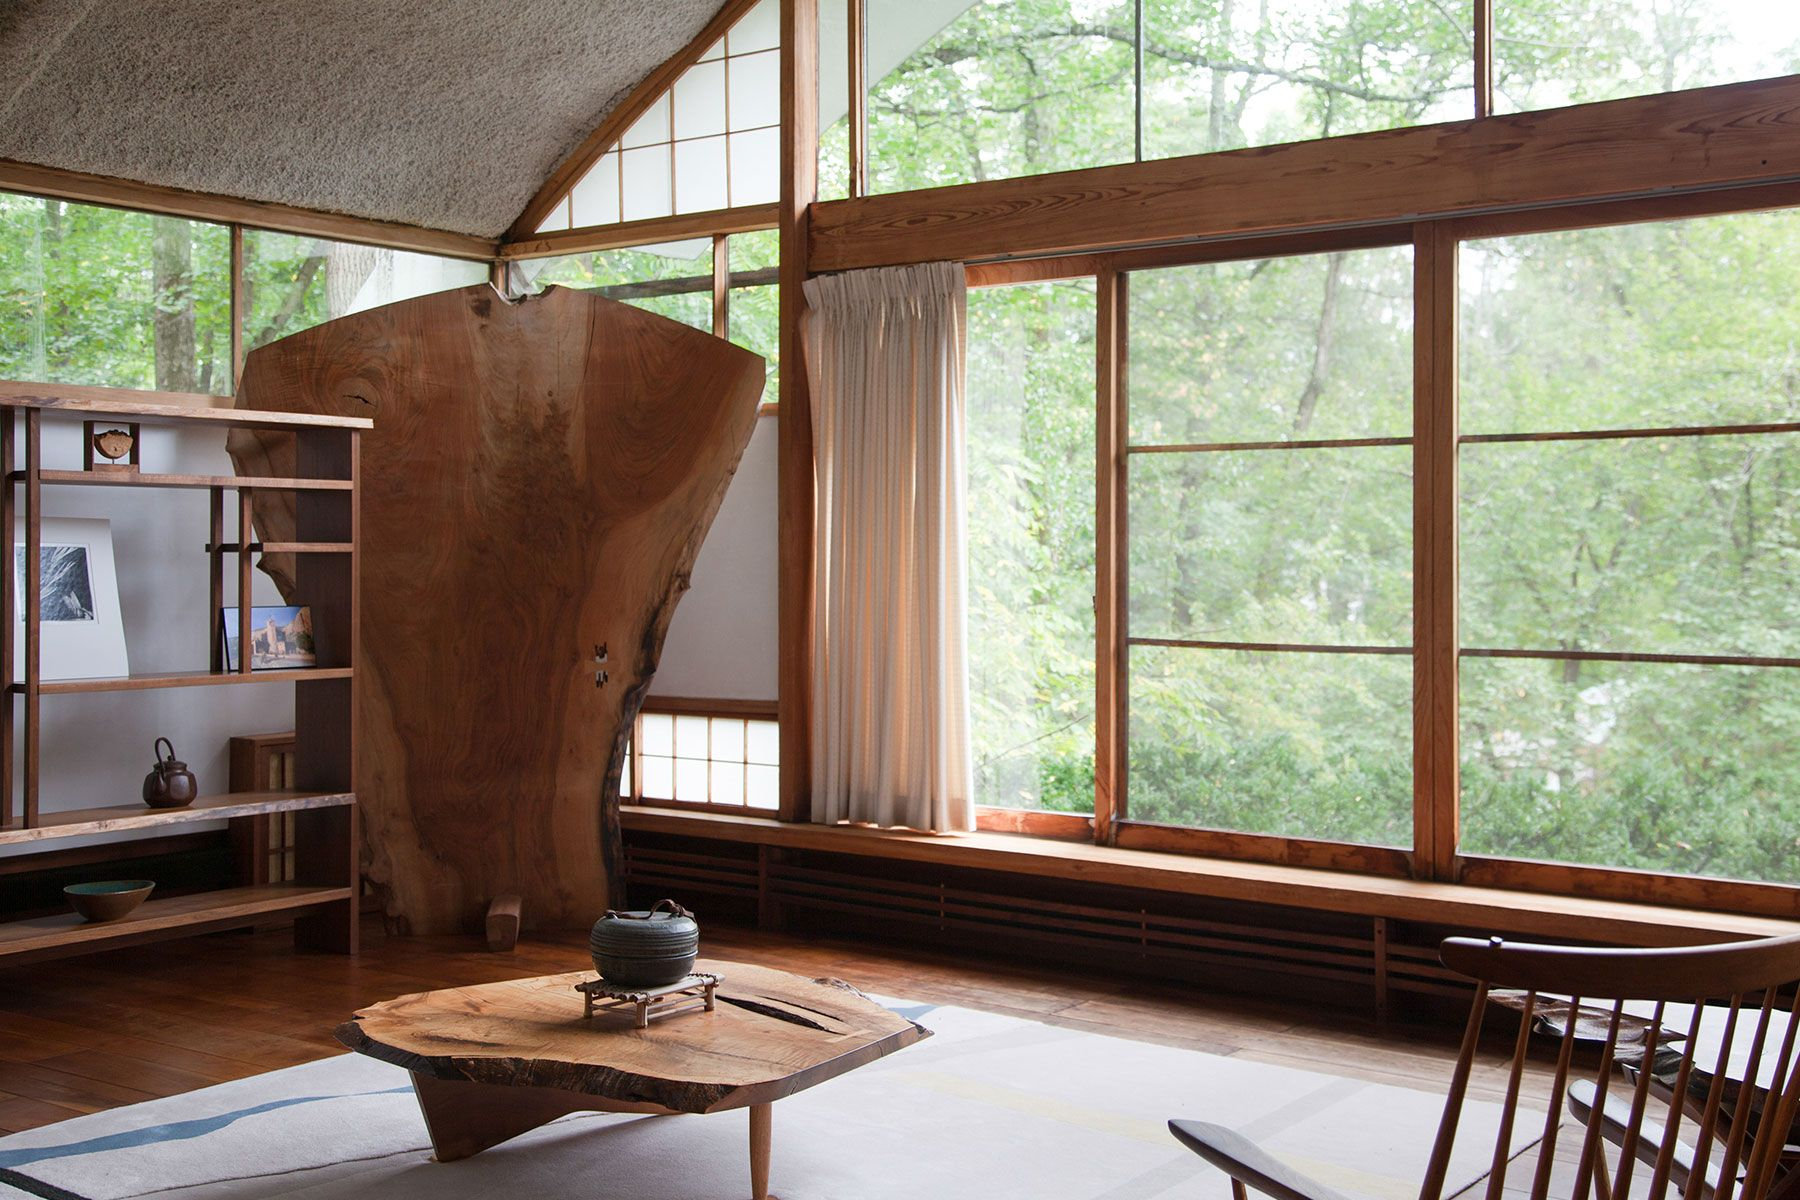 Nakashima u2013 Woodworker Nakashima u2013 Woodworker